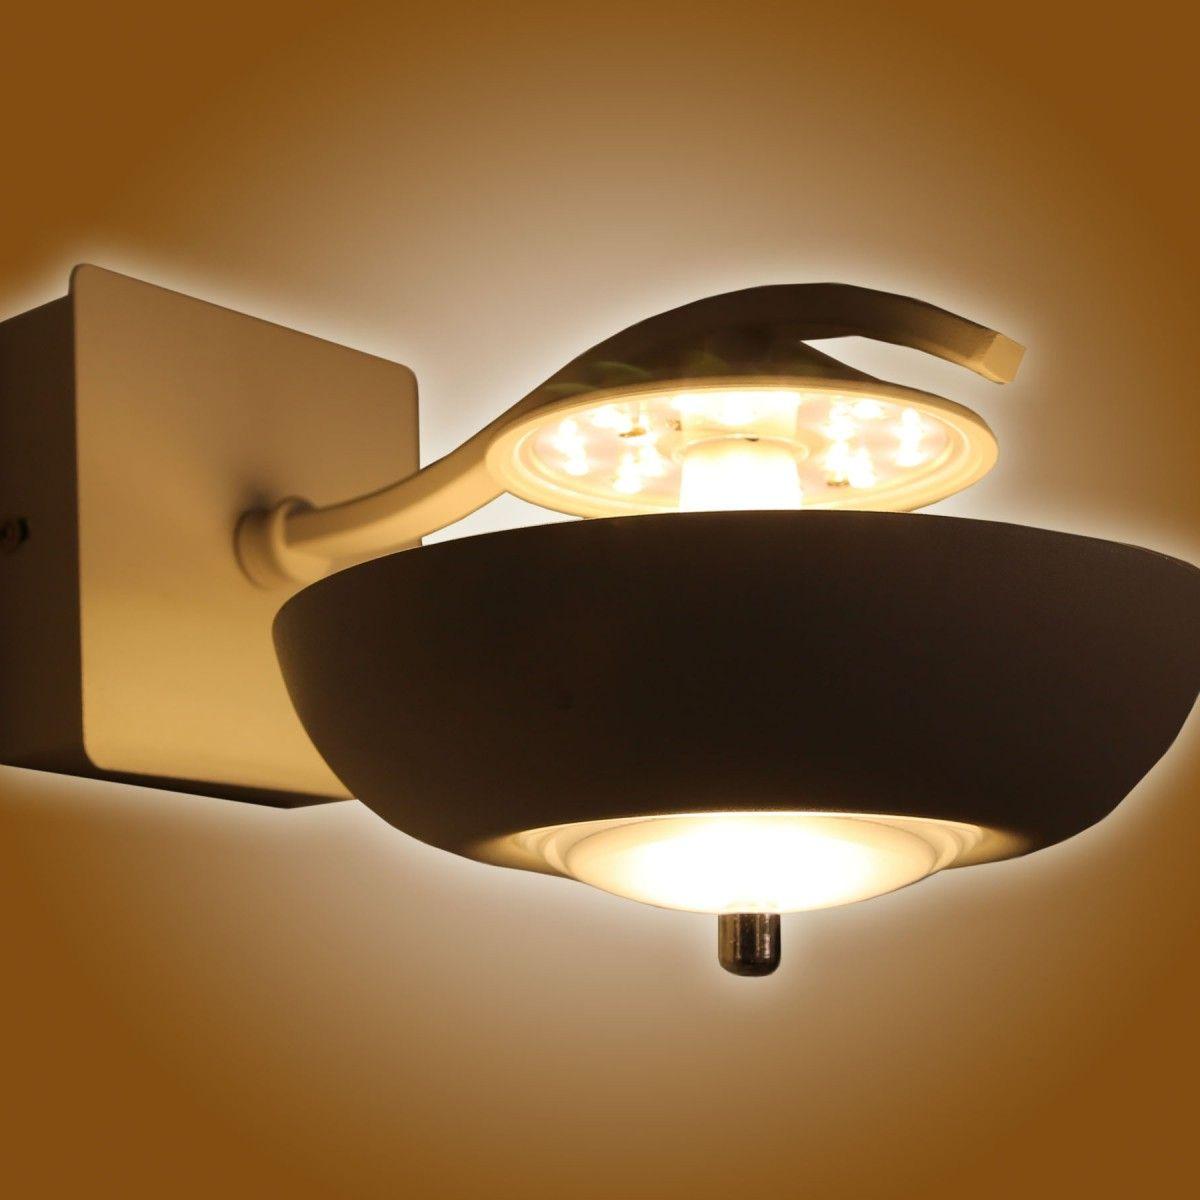 fancy lighting. Looking For Best Designer Fancy Lights Shop In Delhi Chock Out The Huge Collection Of Lighting